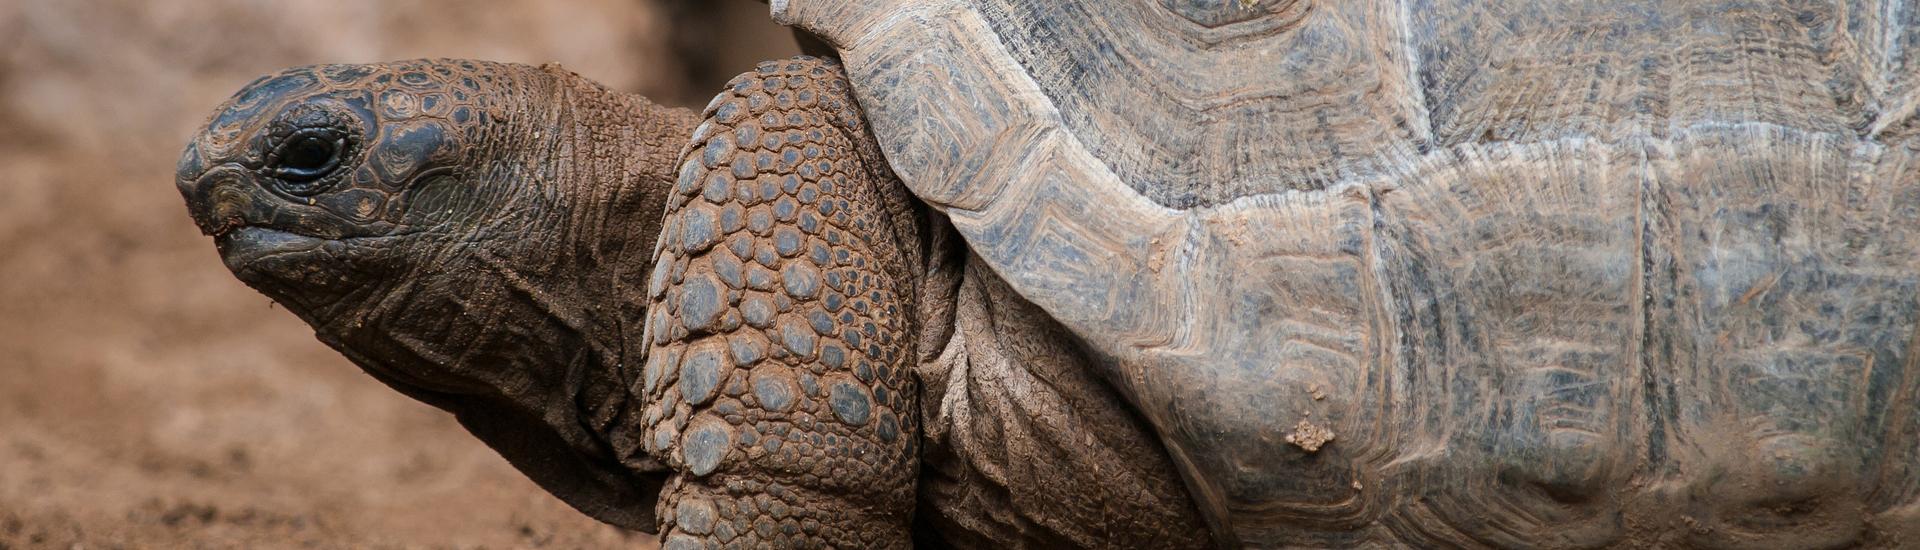 tortoise side view